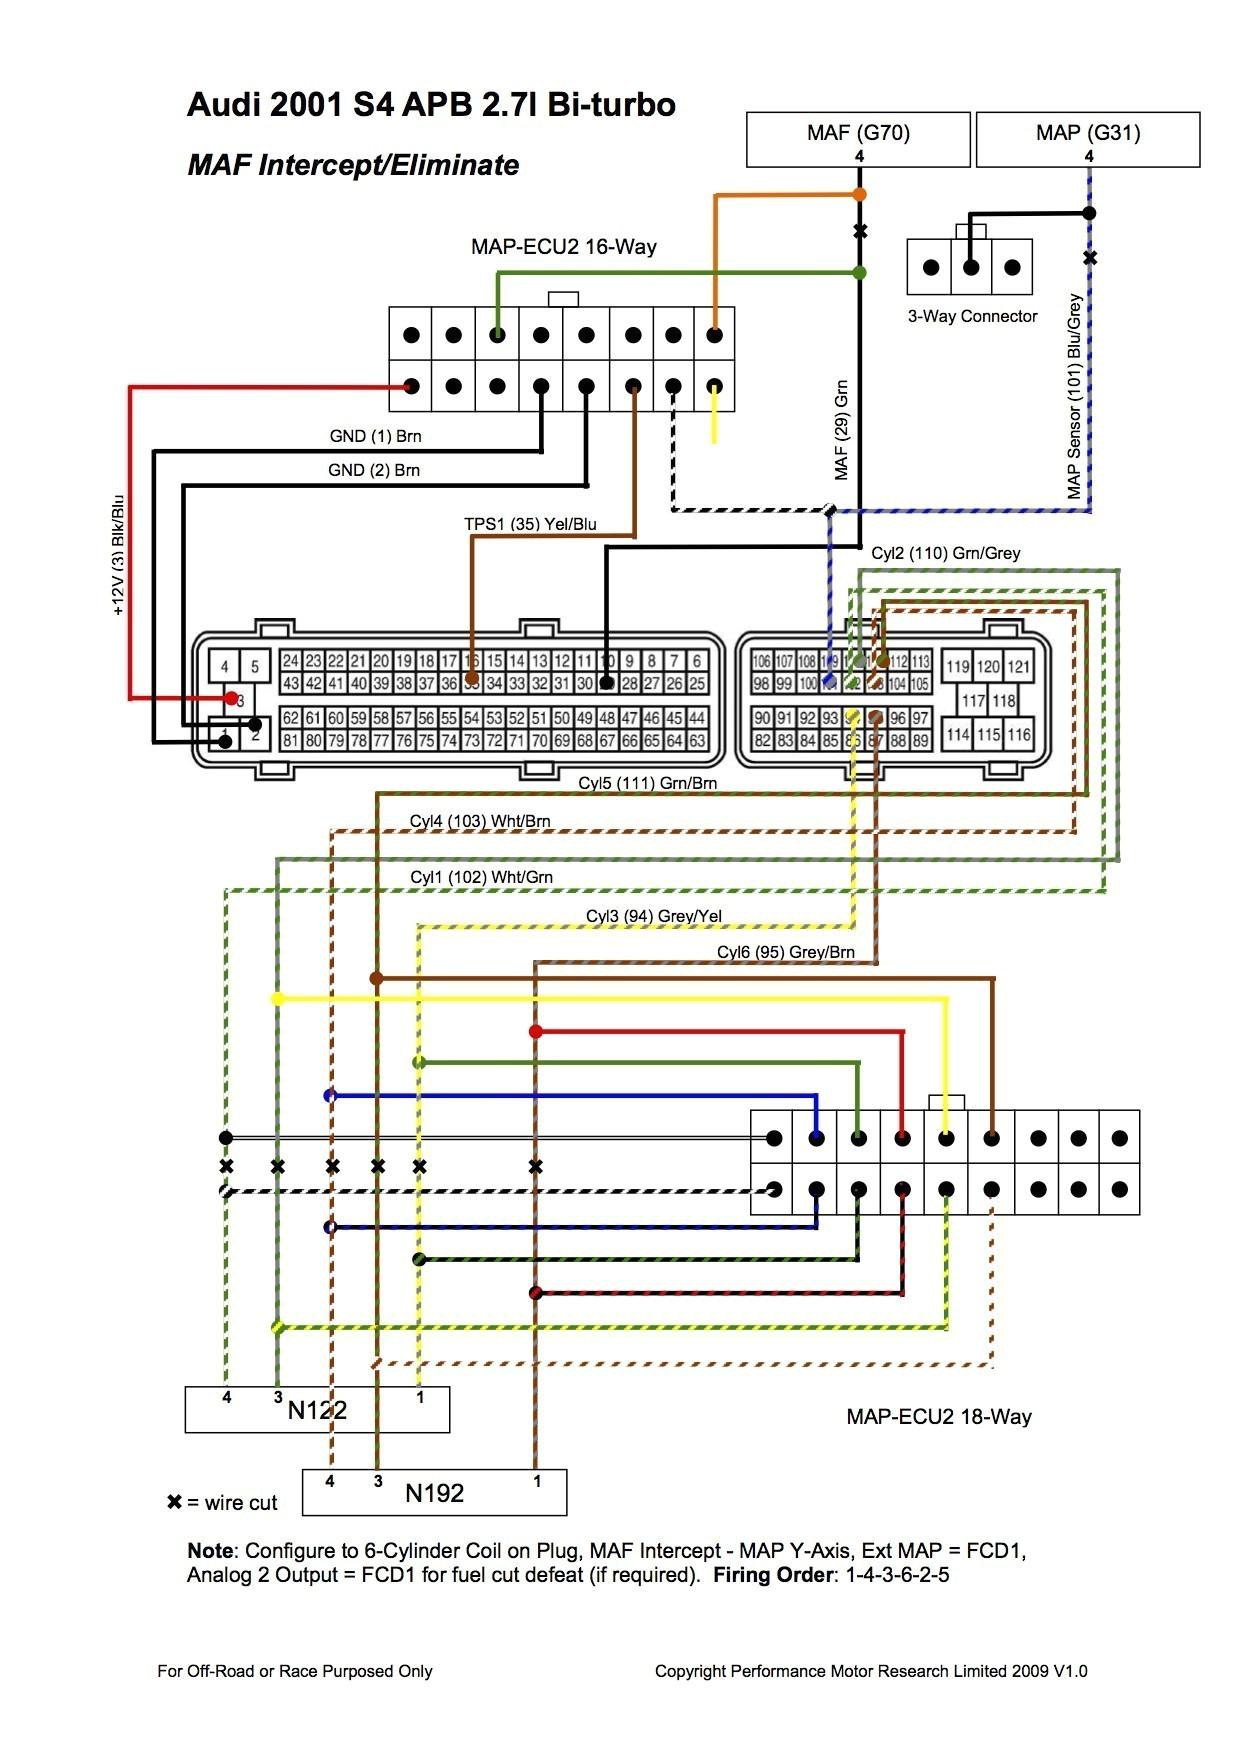 diagram of radio wiring toyota corolla 04 wiring diagram operations wiring diagram likewise toyota corolla radio wiring further cat 5